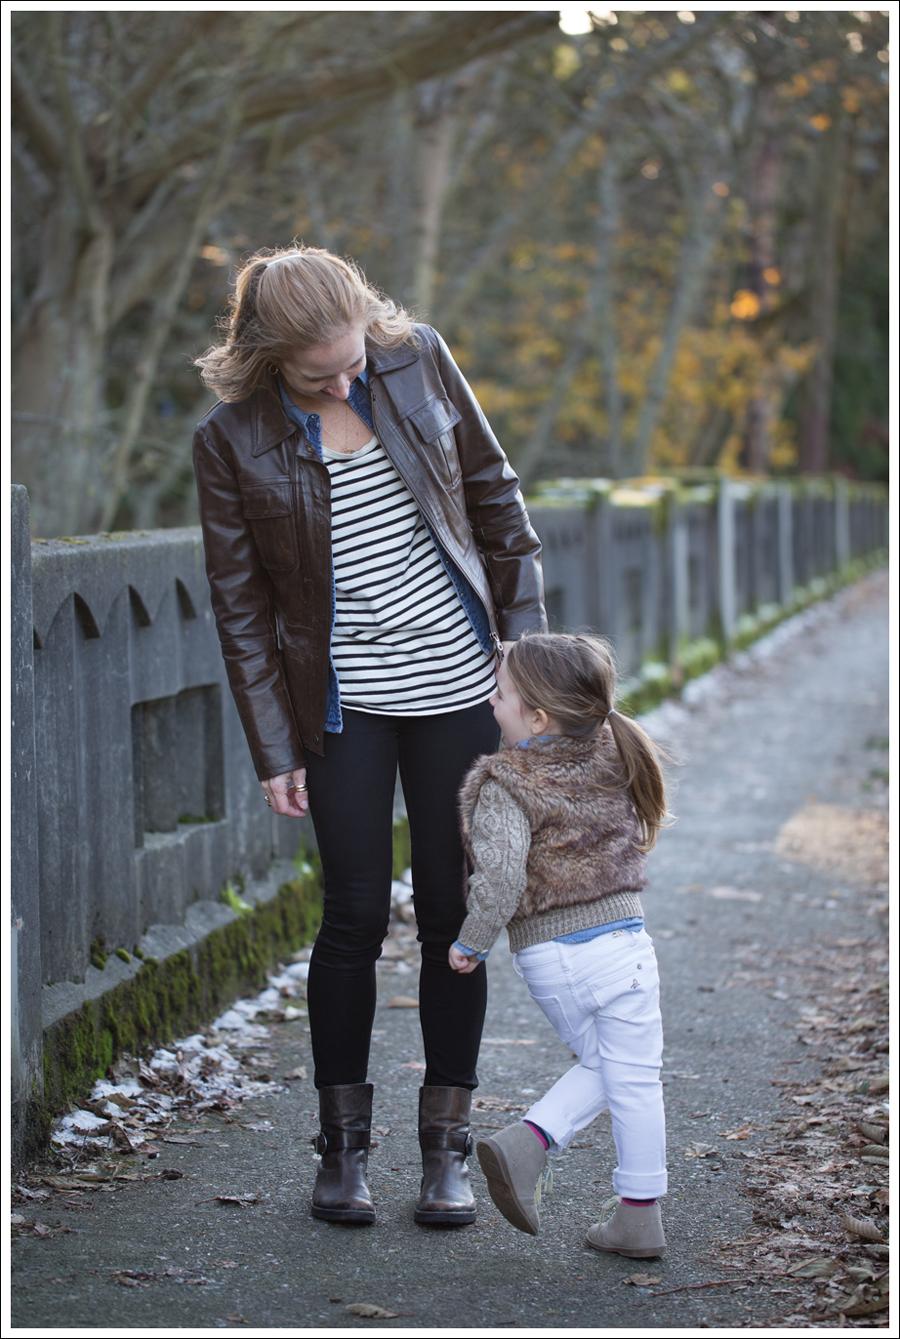 Blog Leather Jacket Gap Jean Shirt StyleMint DL1961 Emma Riker Cafe Noire Booties-7